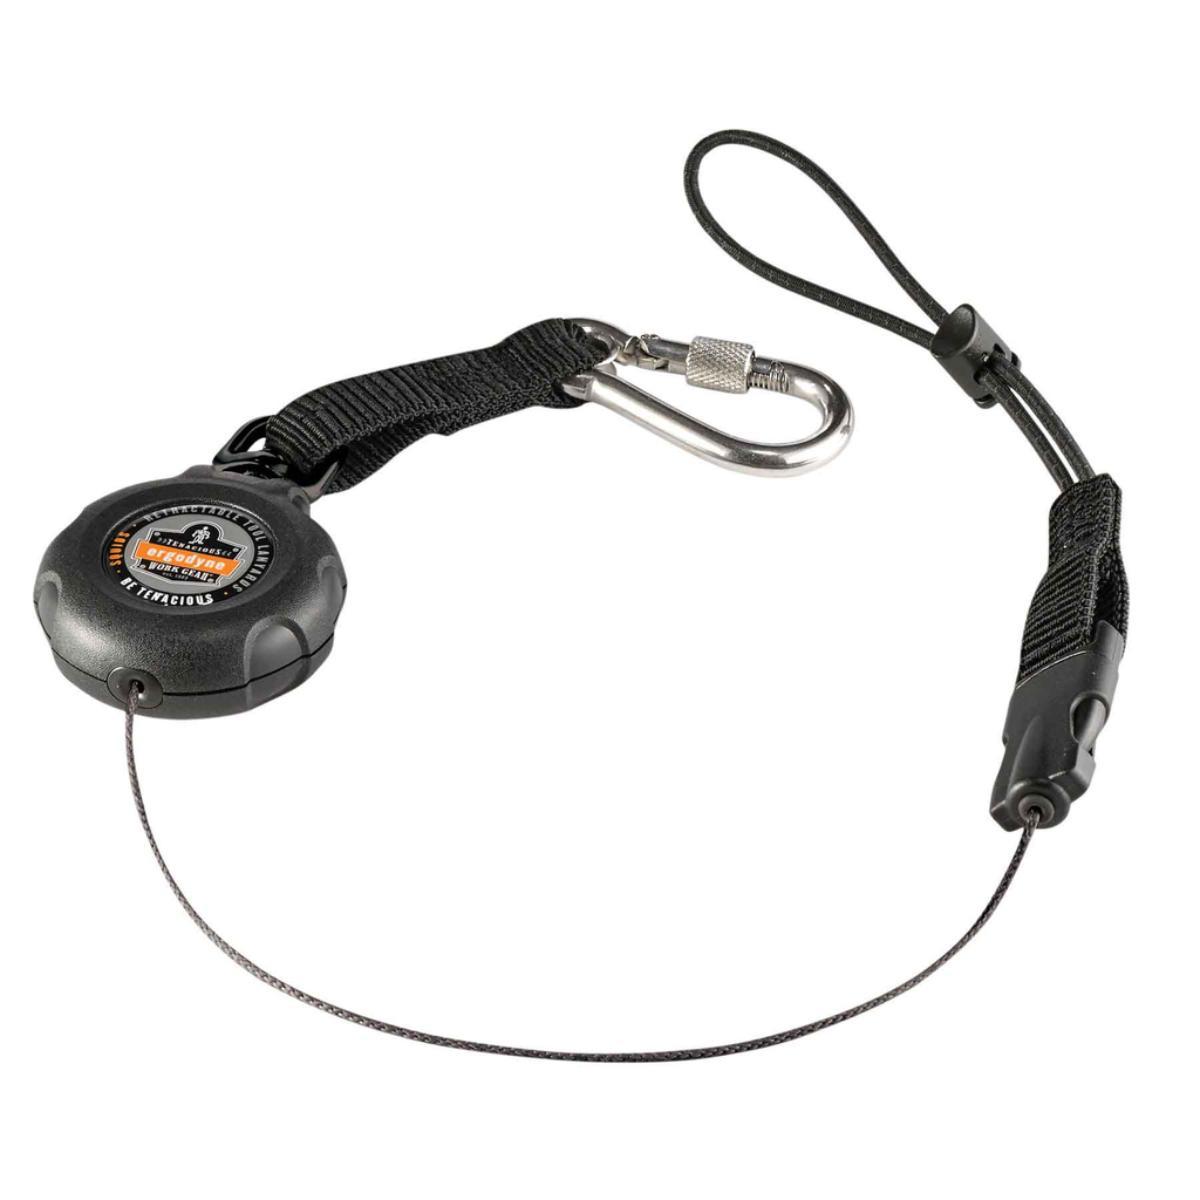 3001 Standard Black Retractable Single Carabiner w/loop end - 2lb